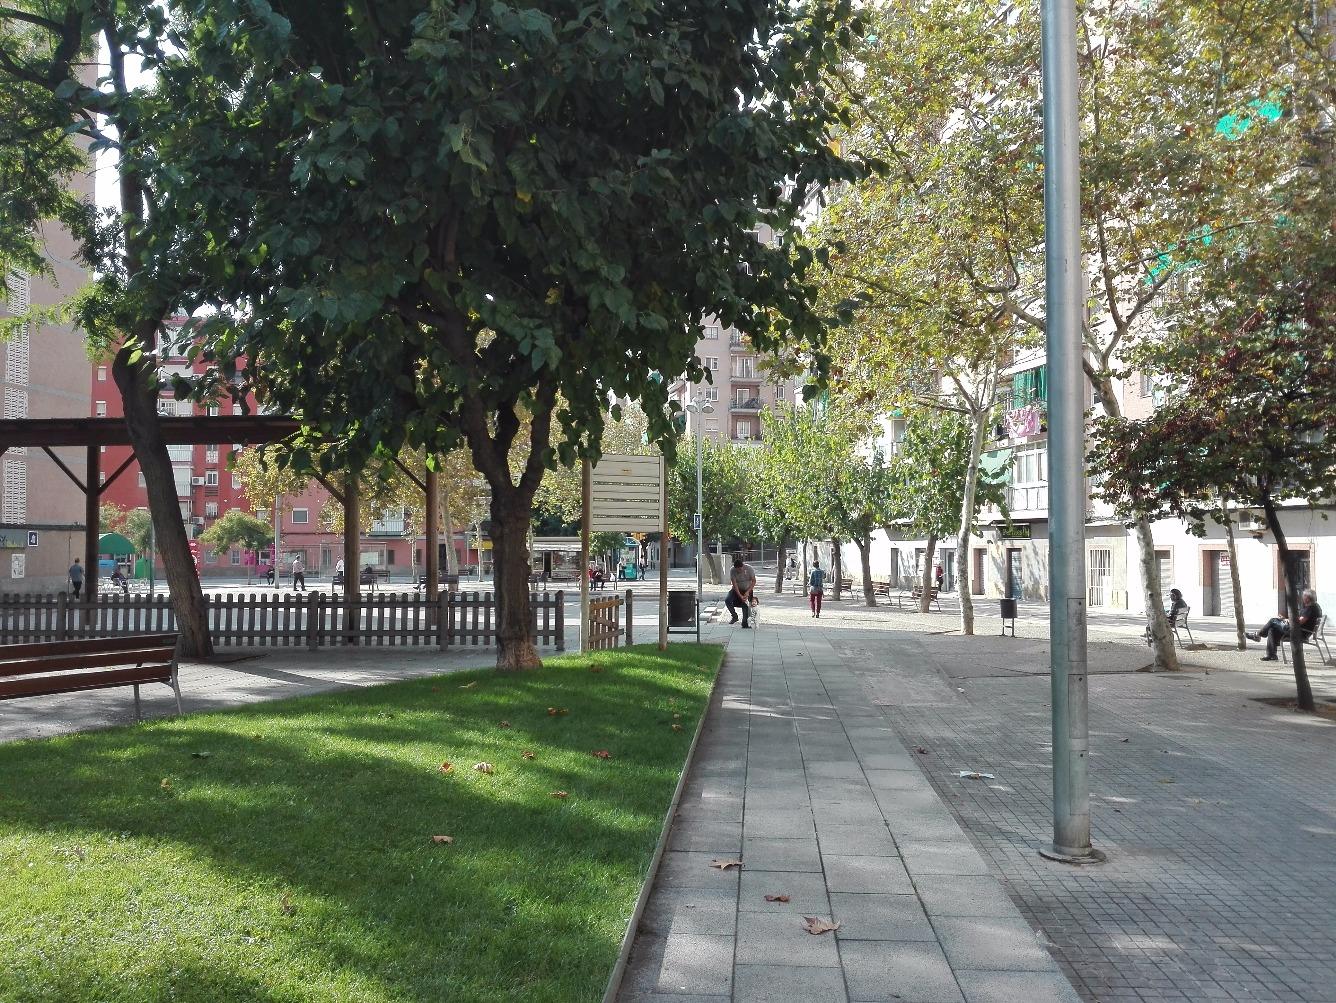 Planta baja en Calle AV CORTS CATALANES